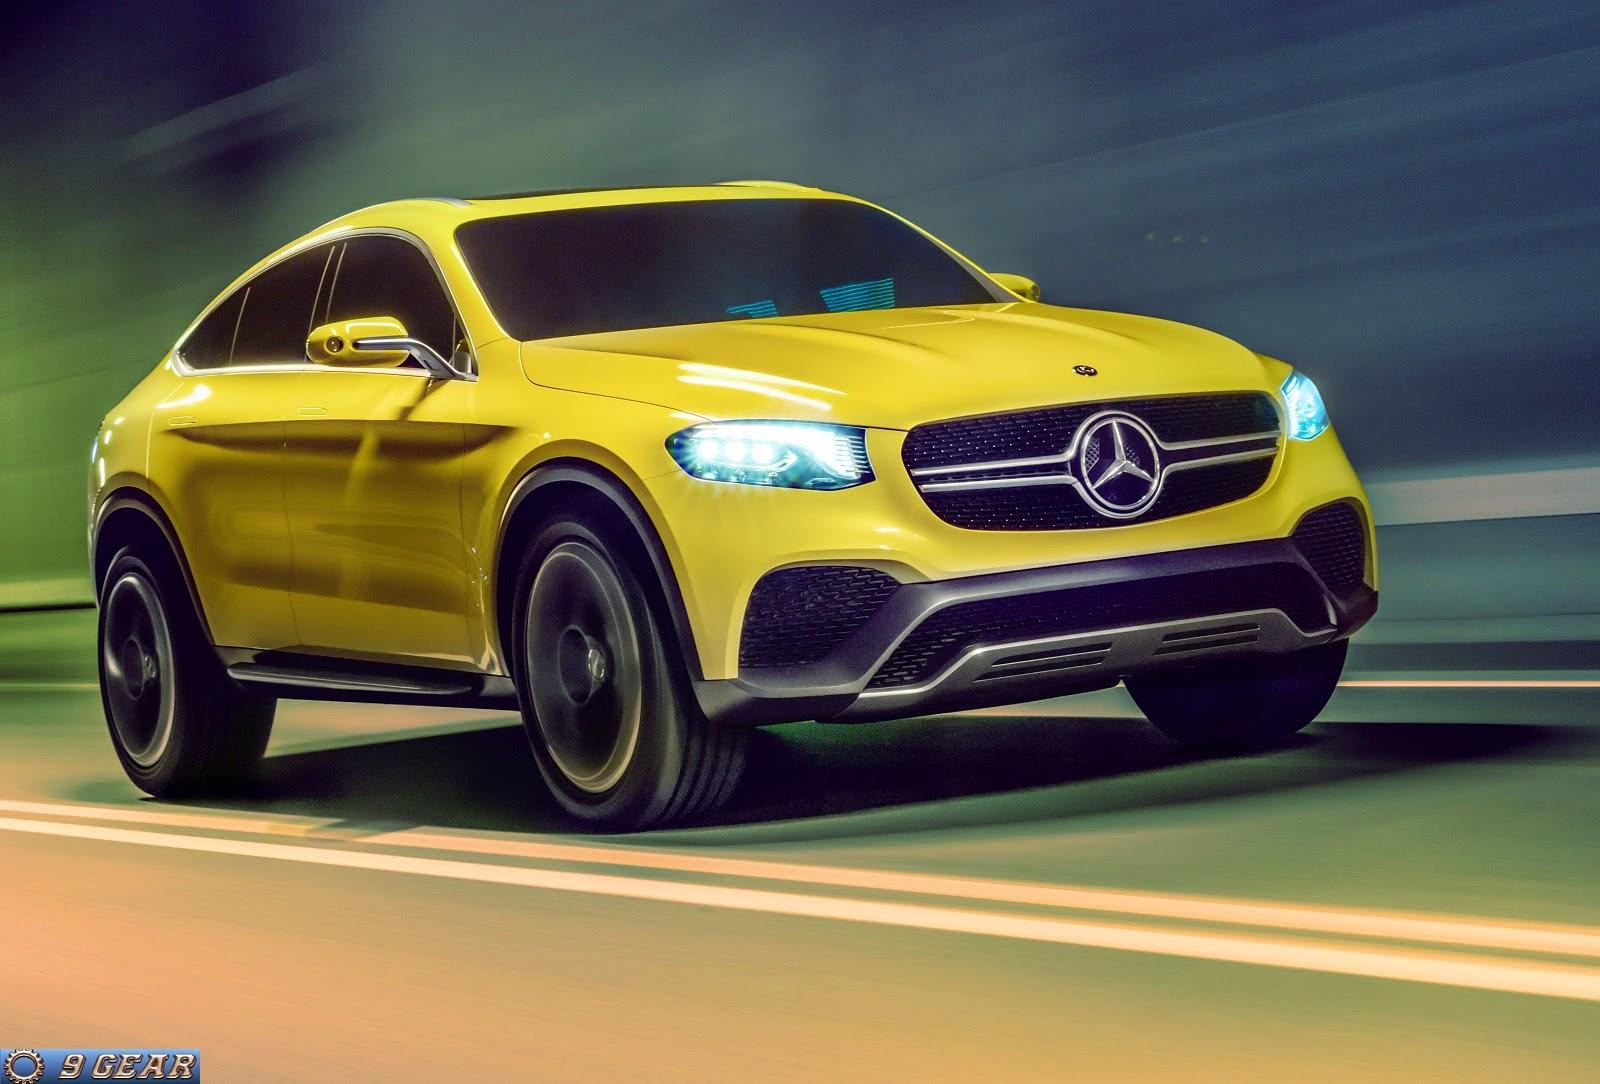 http://4.bp.blogspot.com/-H0OKHrXcn0o/VTPB4BEncII/AAAAAAAAb7g/KUH0JO1kTw0/s1600/Mercedes-Benz-Concept-GLC-Coup%C3%A9014.jpg